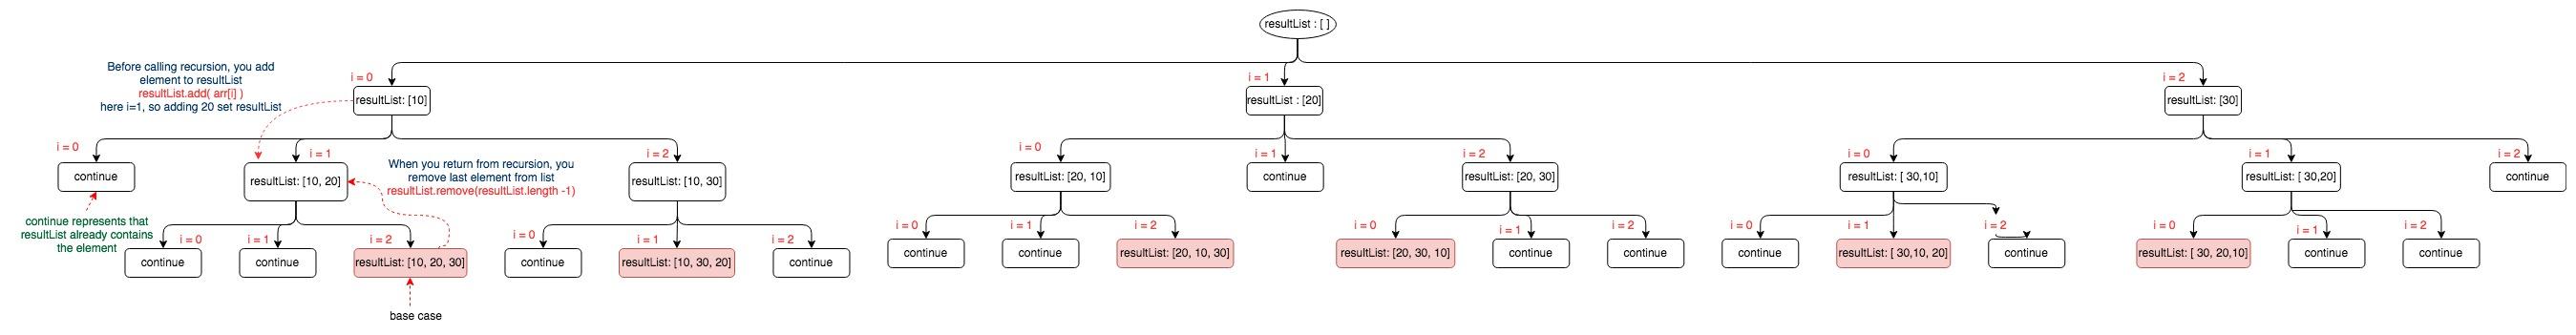 Recursion permutation